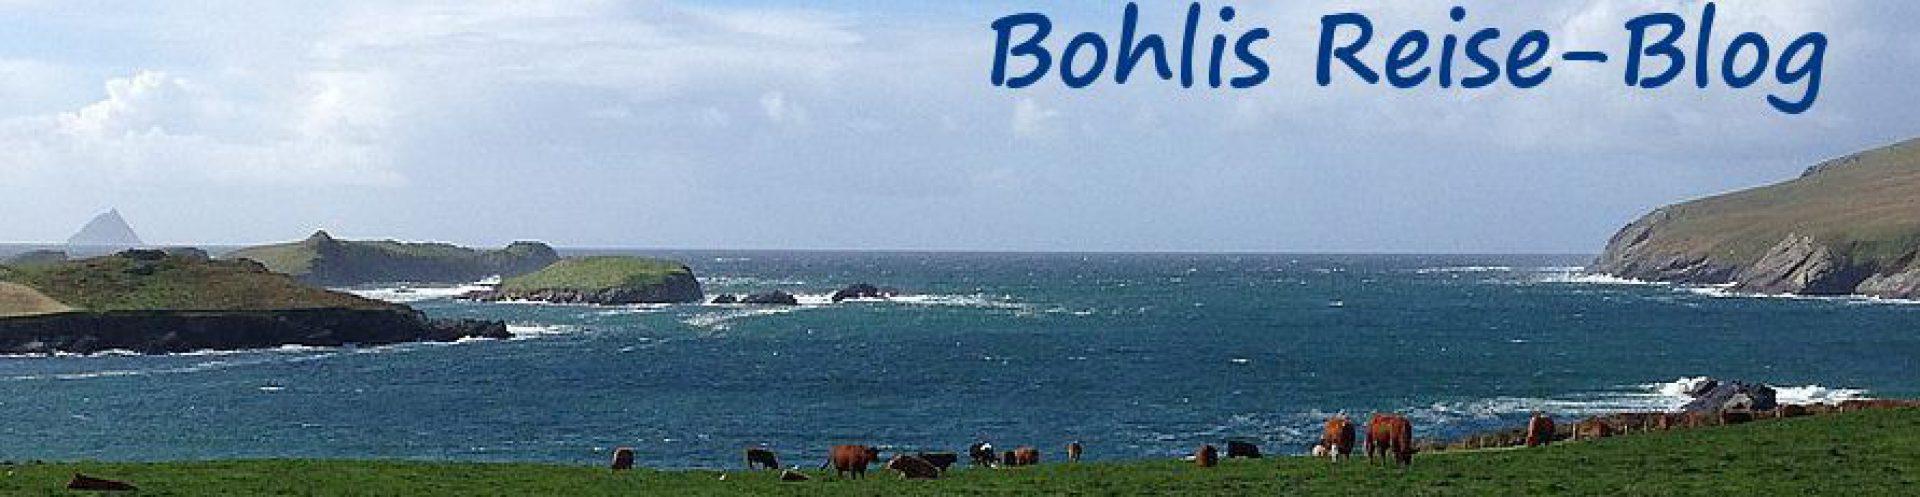 Bohlis Reiseblog